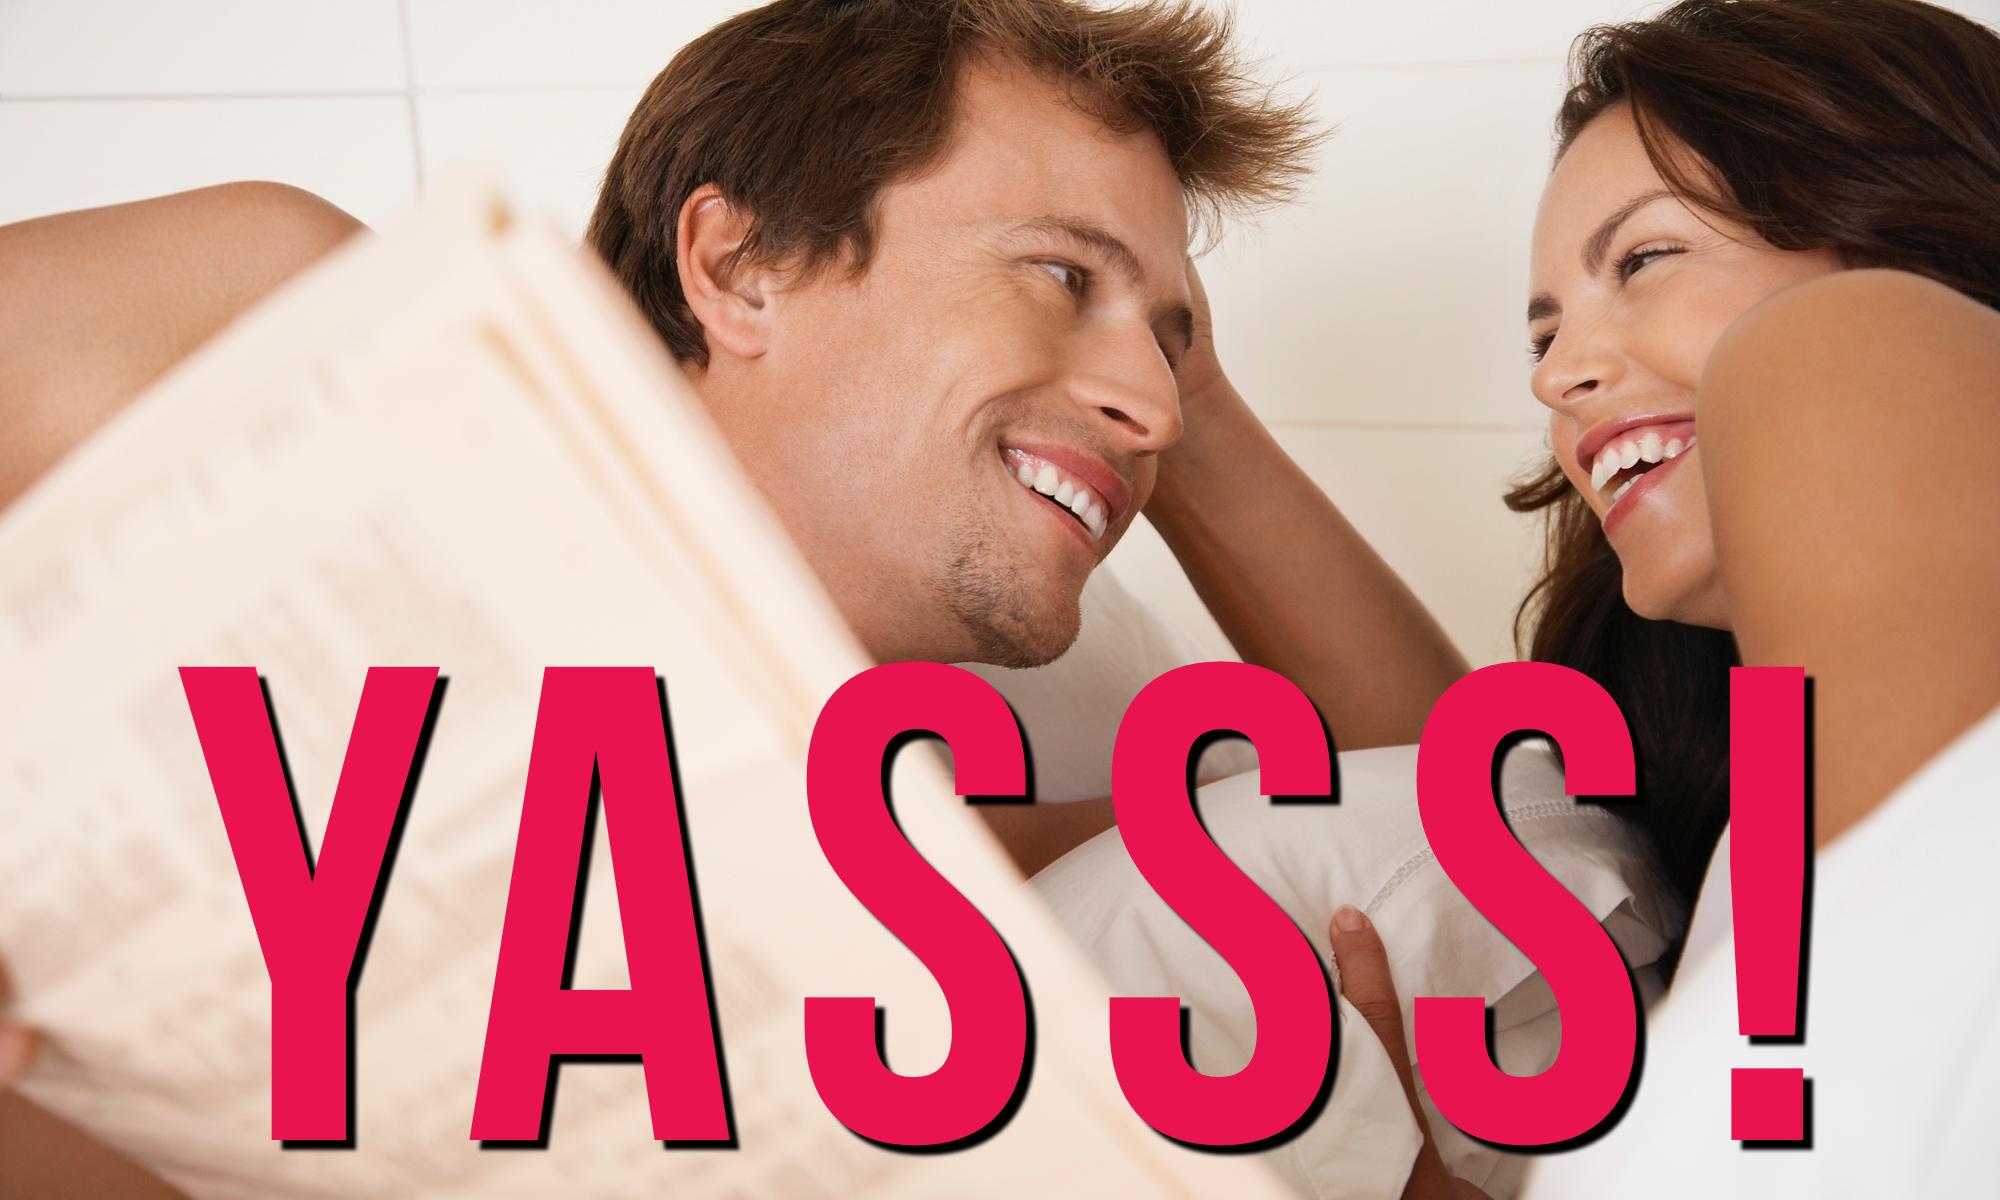 Sex Makes You Happier